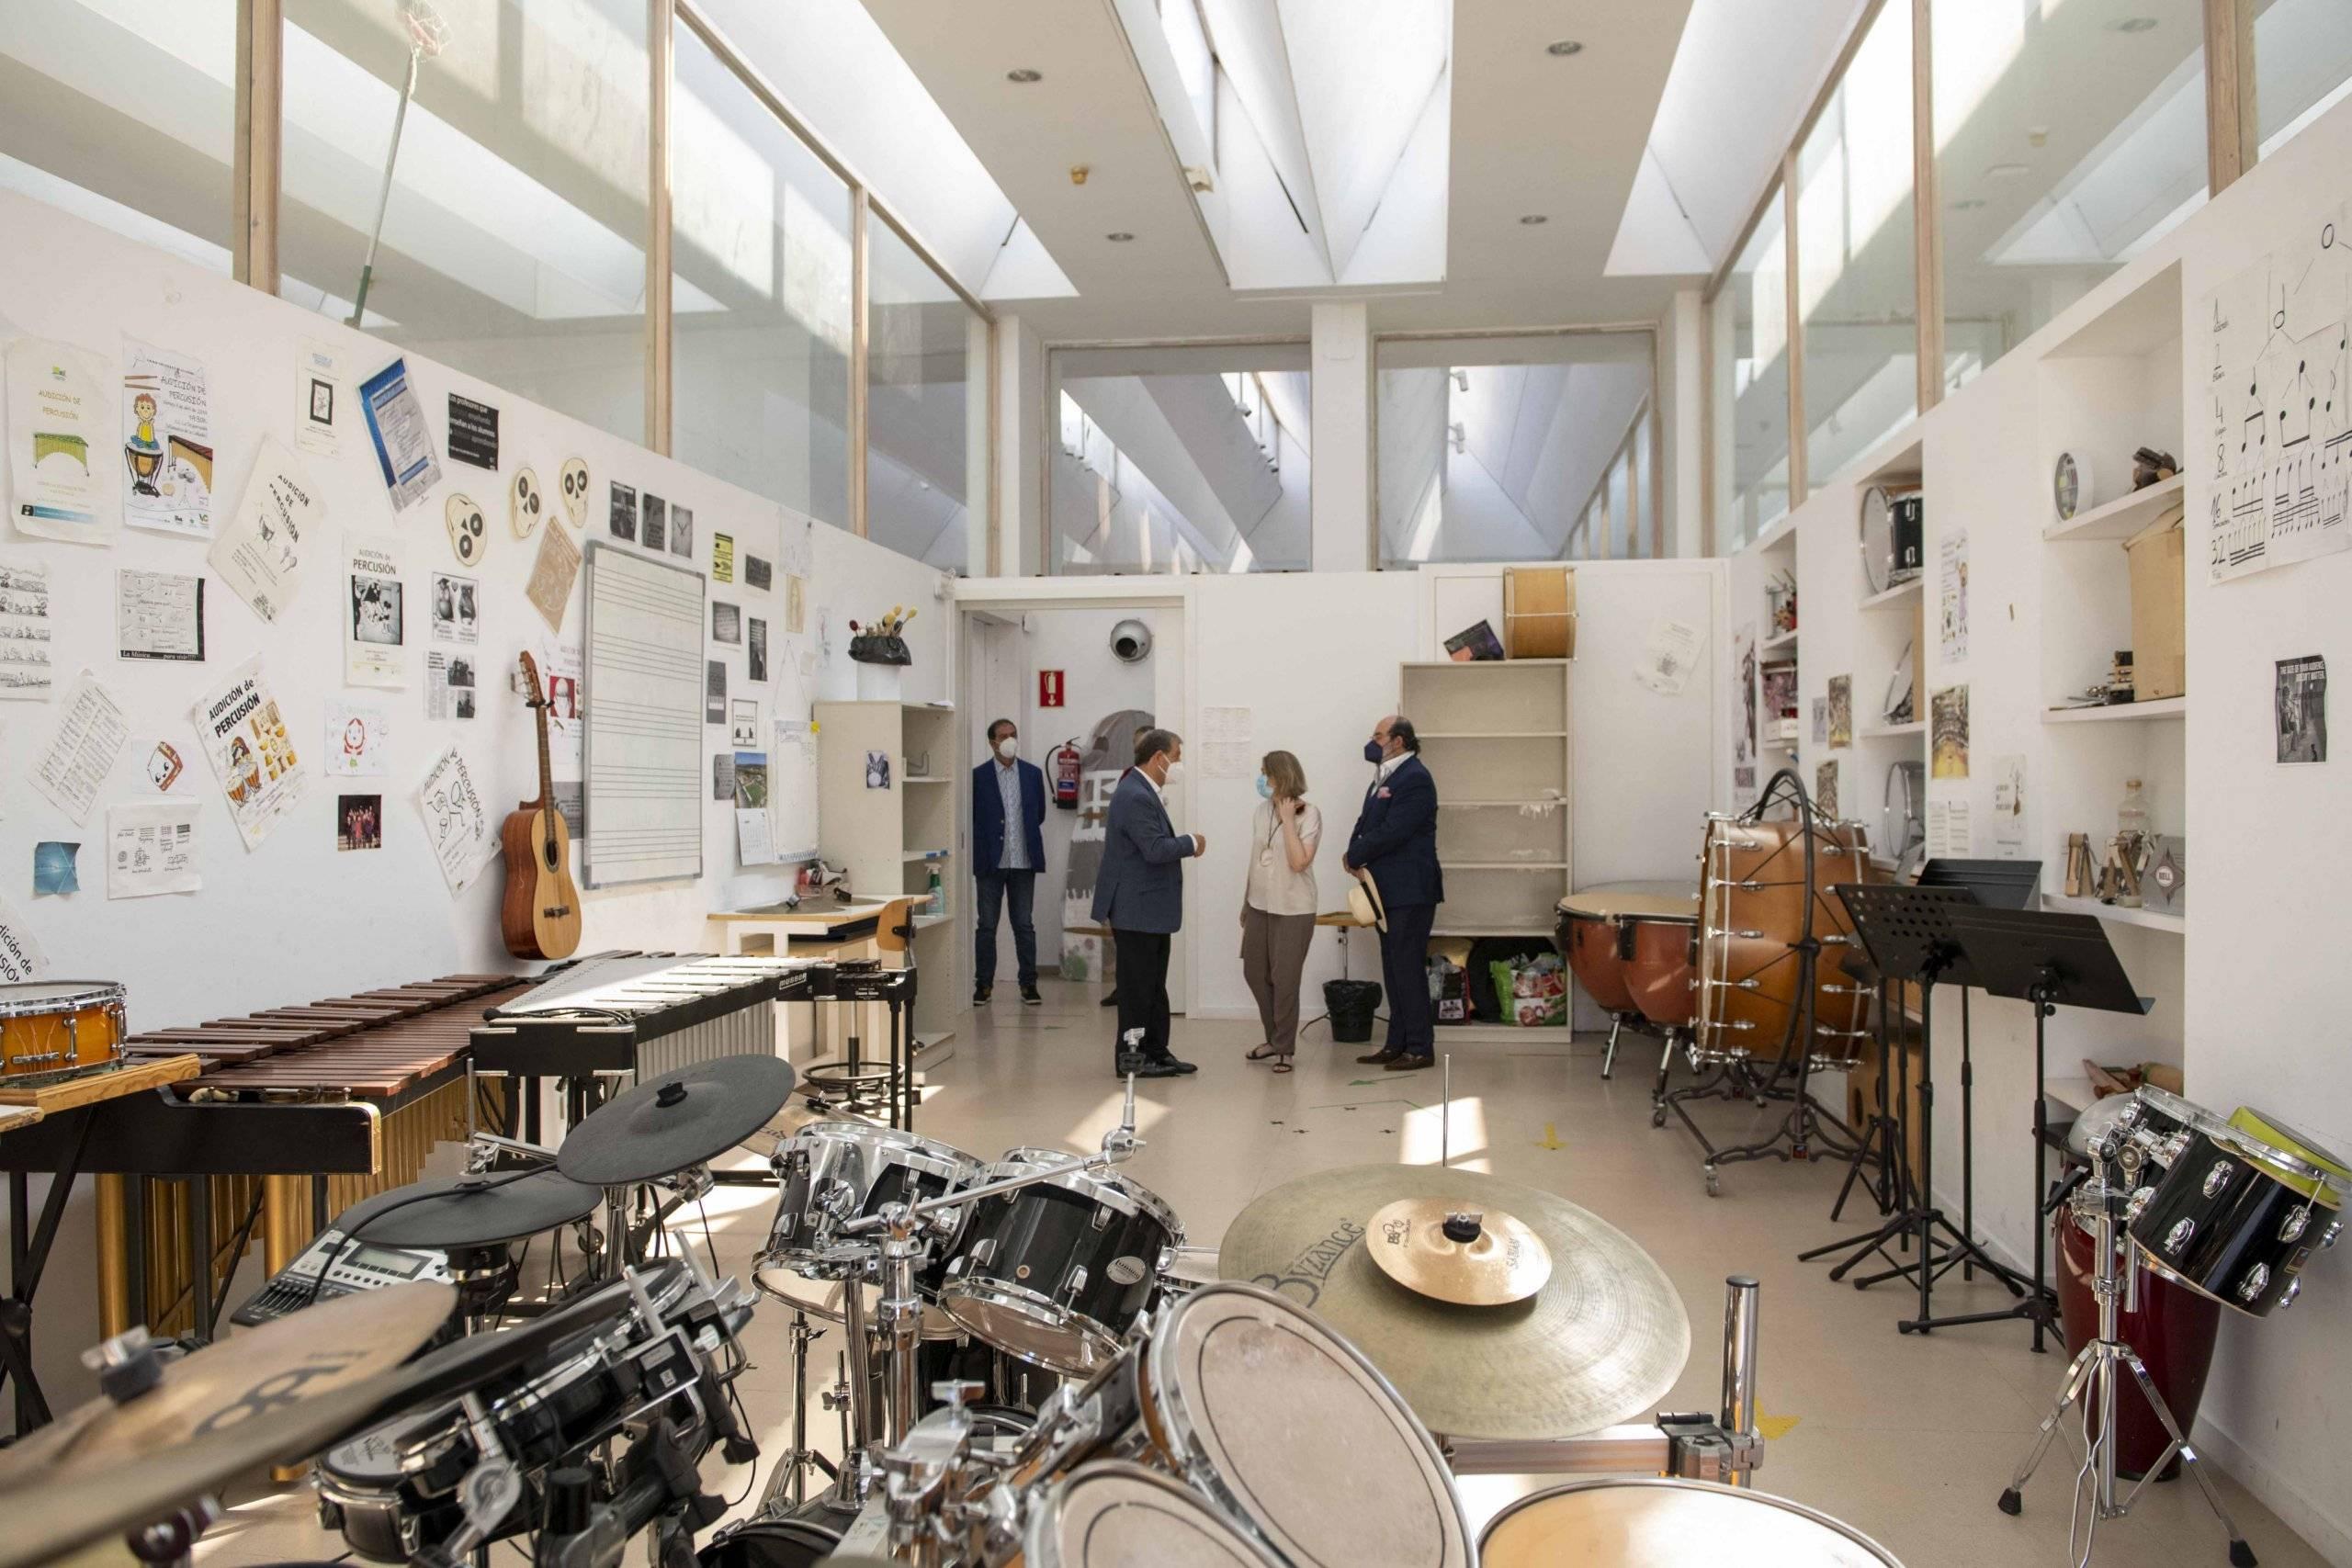 Visita a la Sala de Música ubicada en el C.C. La Despernada.